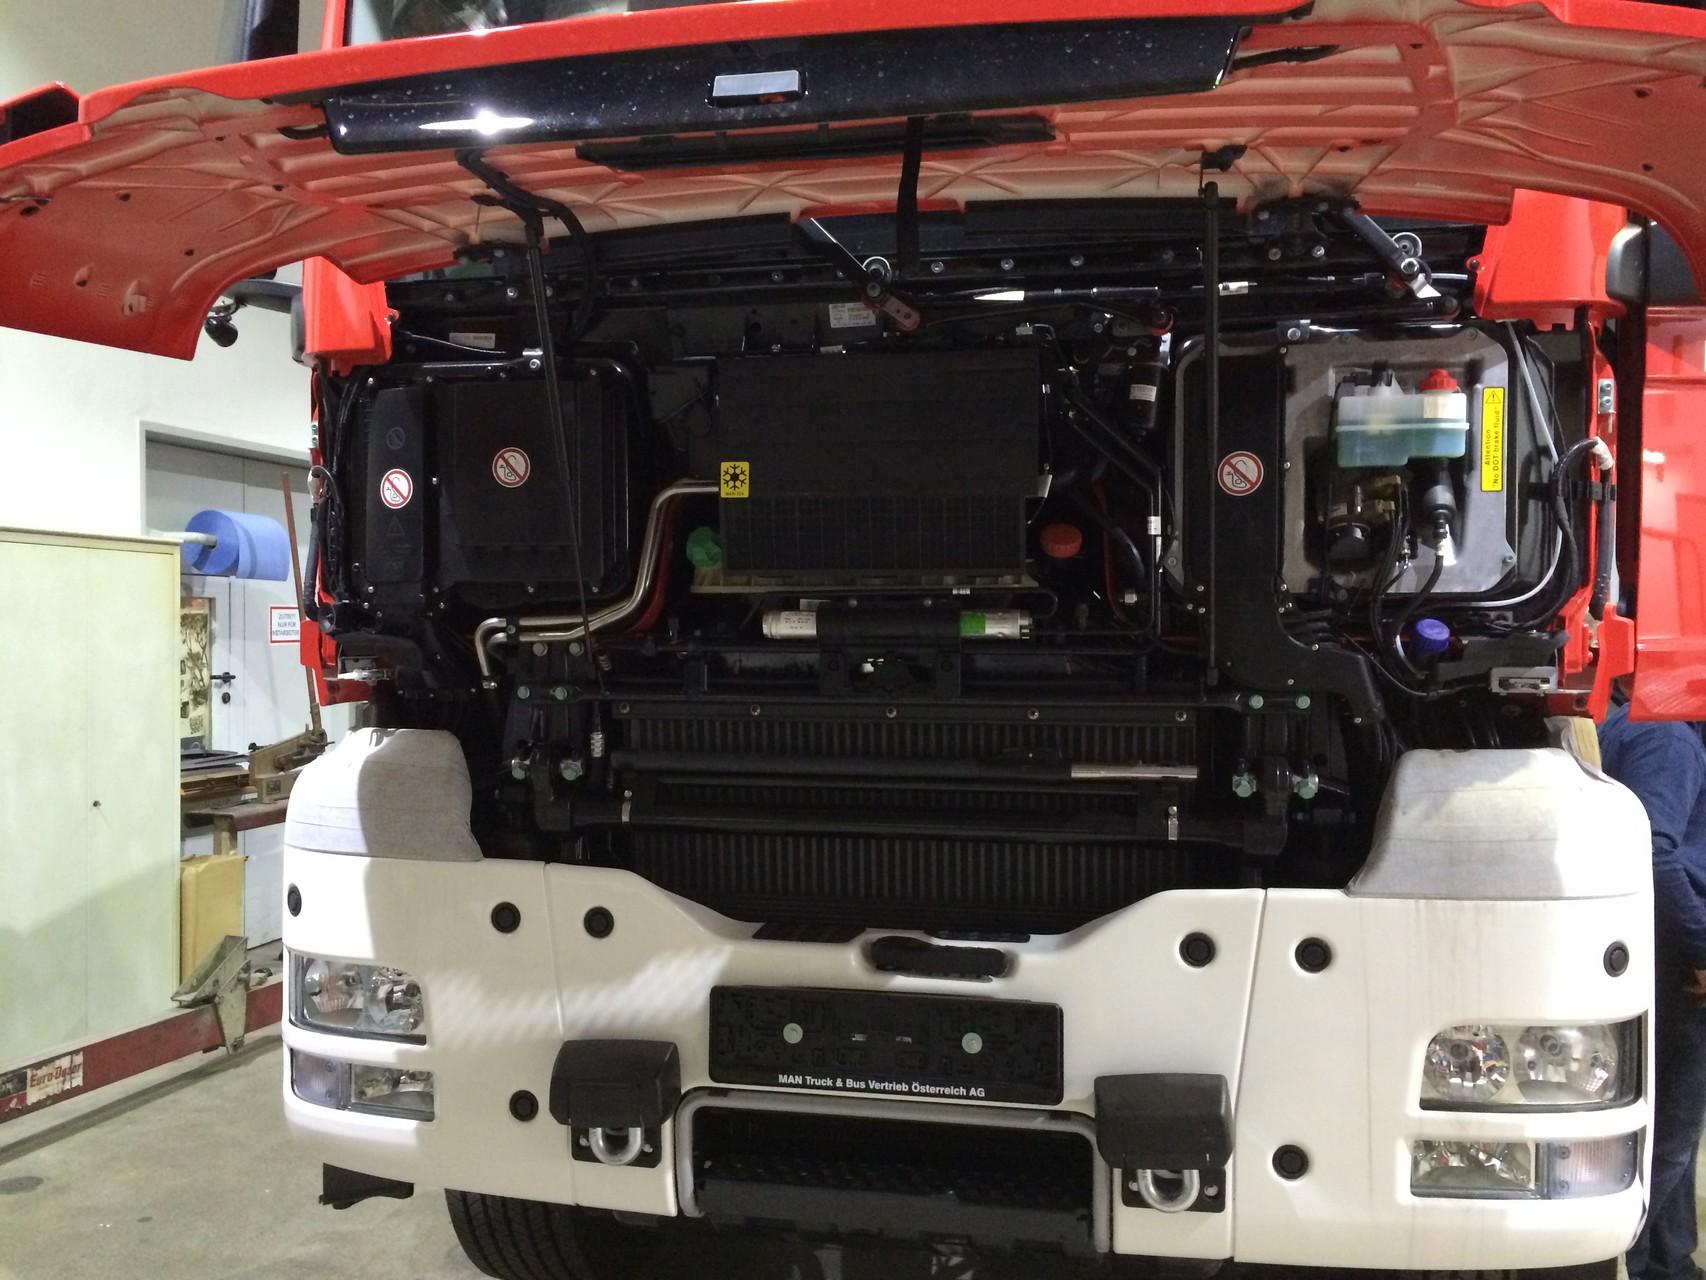 Fahrzeugtechnik - Baustelle